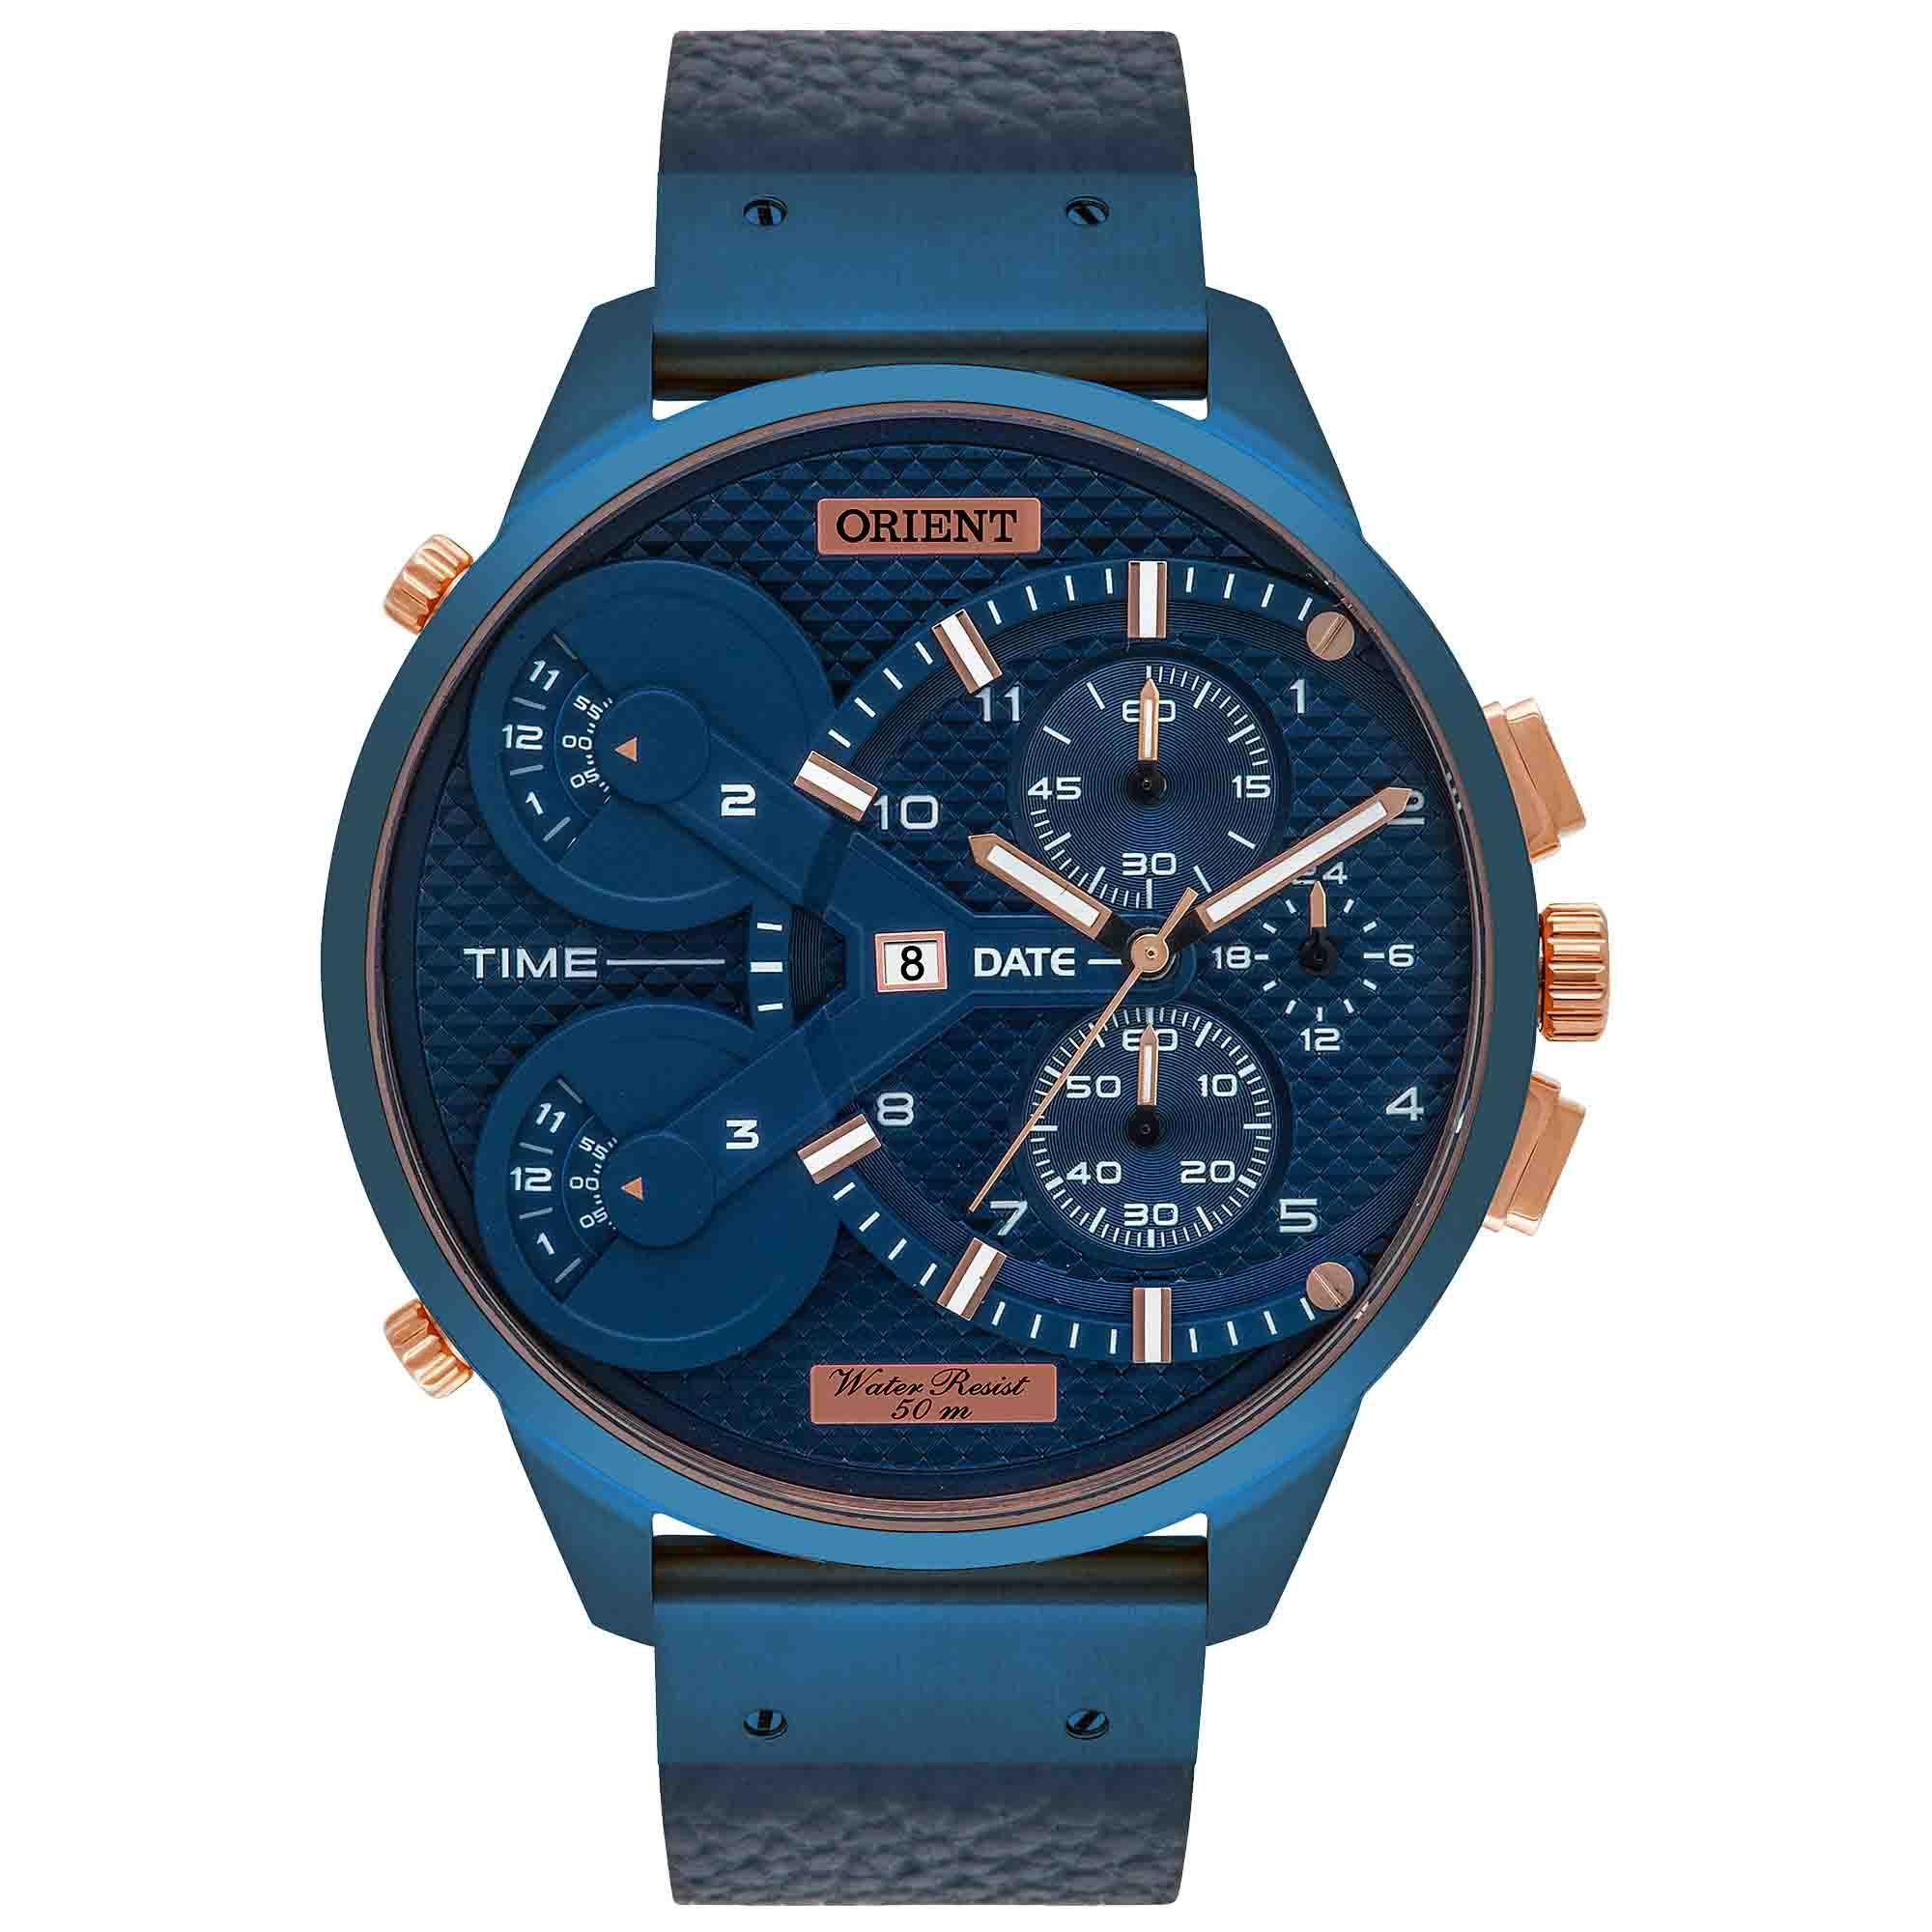 Relógio Masculino Orient MASCT001 D2DX